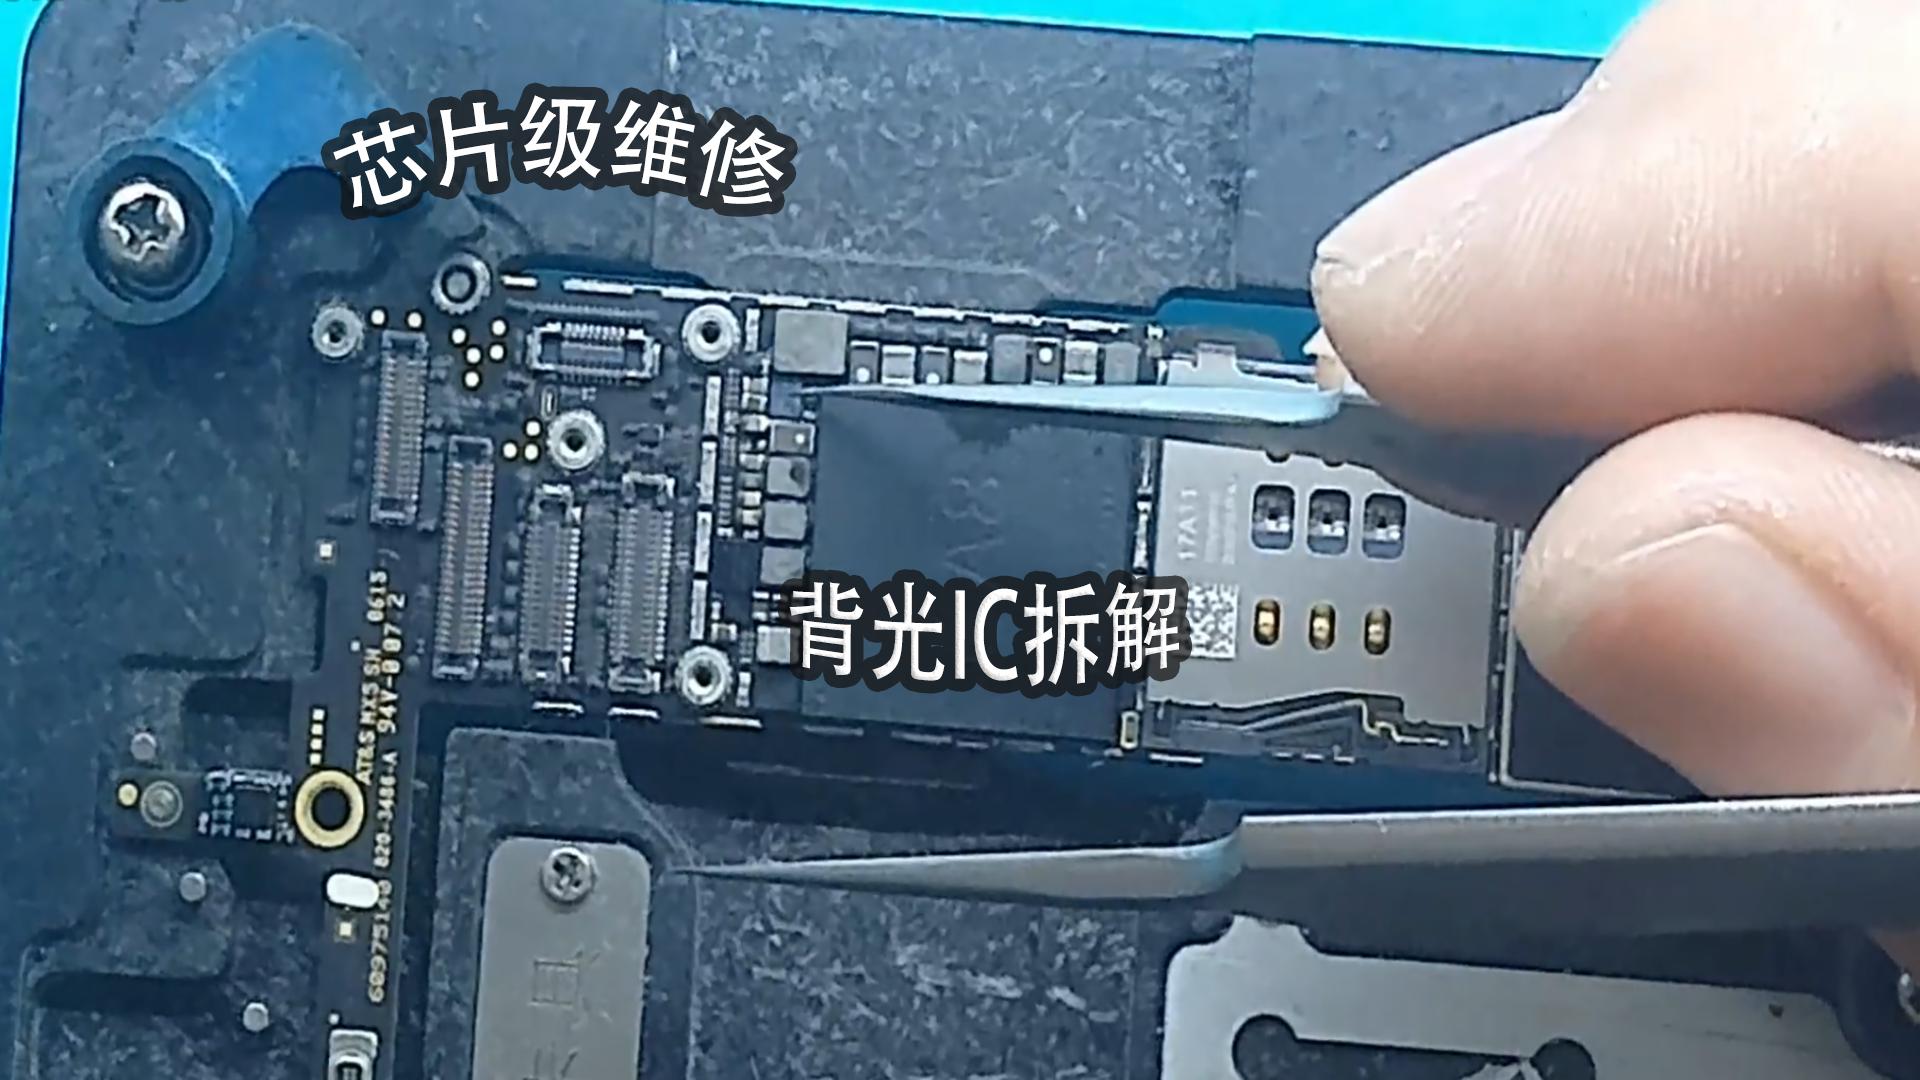 iPhone6开机屏幕不显示,不要着急换屏幕,拆下主板检查下